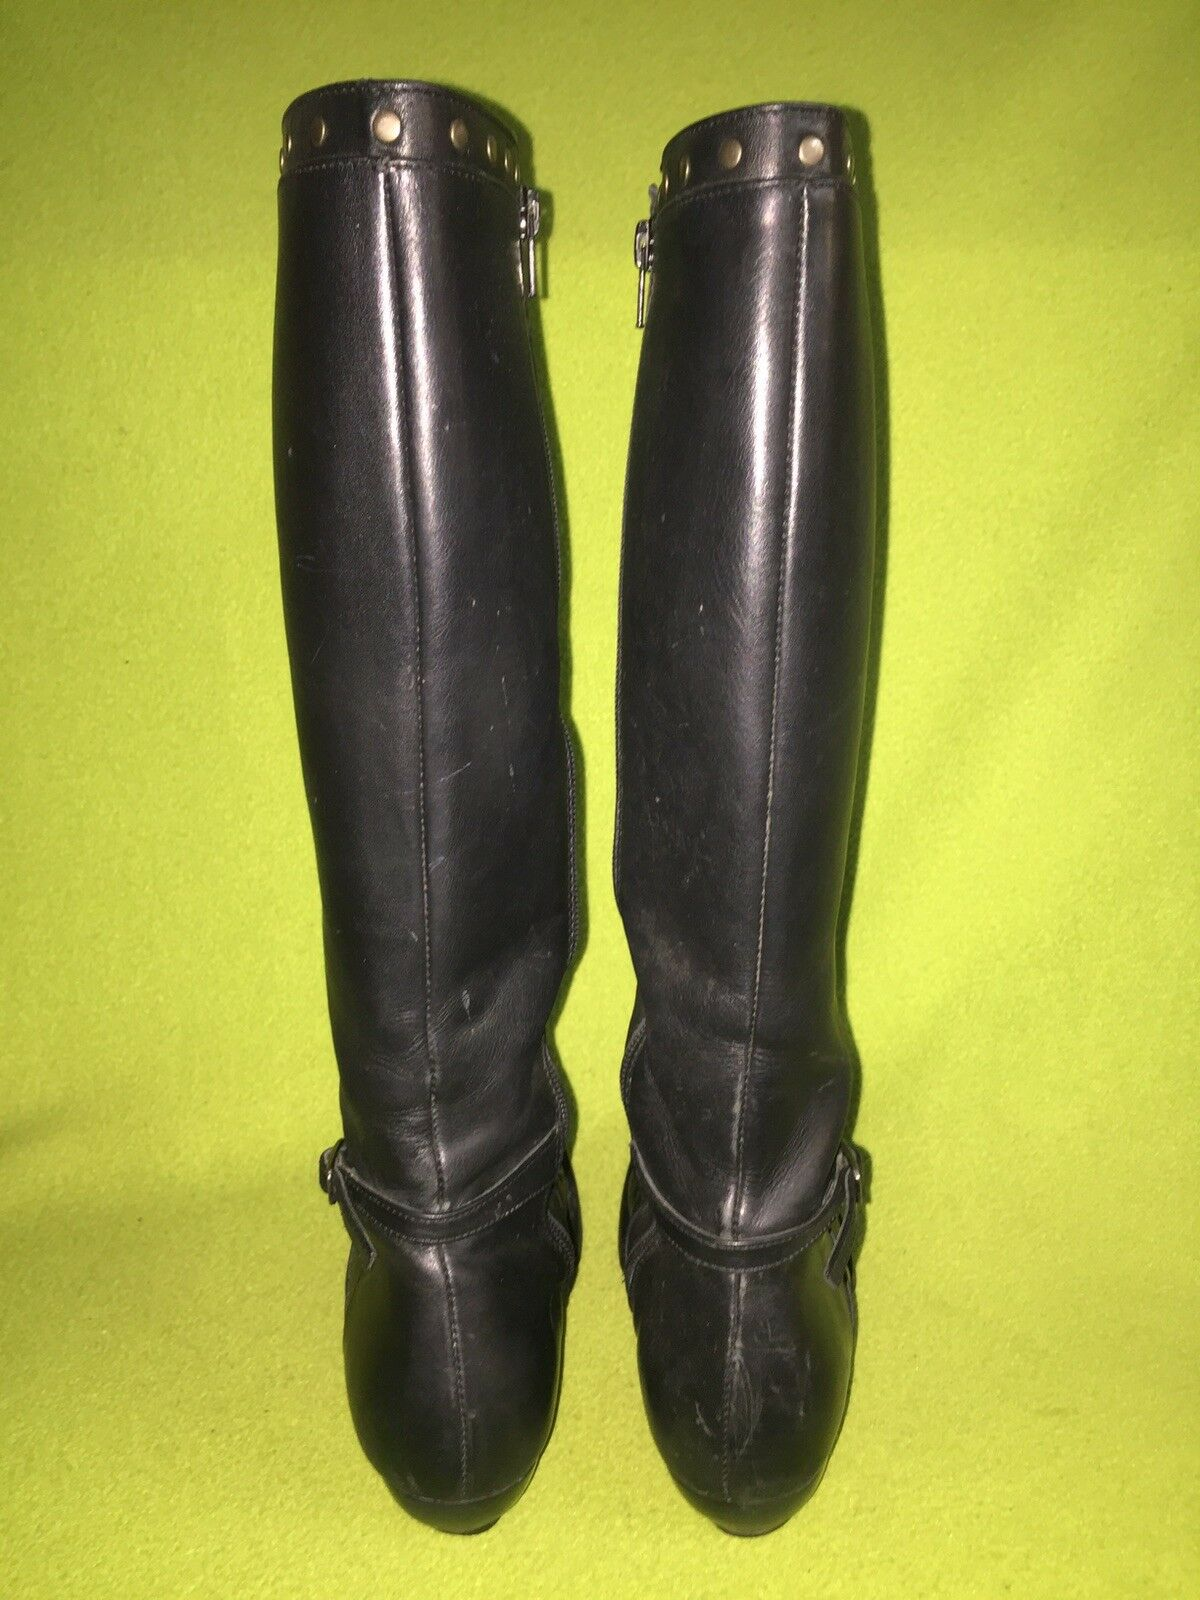 Black Fluevog Studded Freedom Boots Boots Boots 7 1b3250